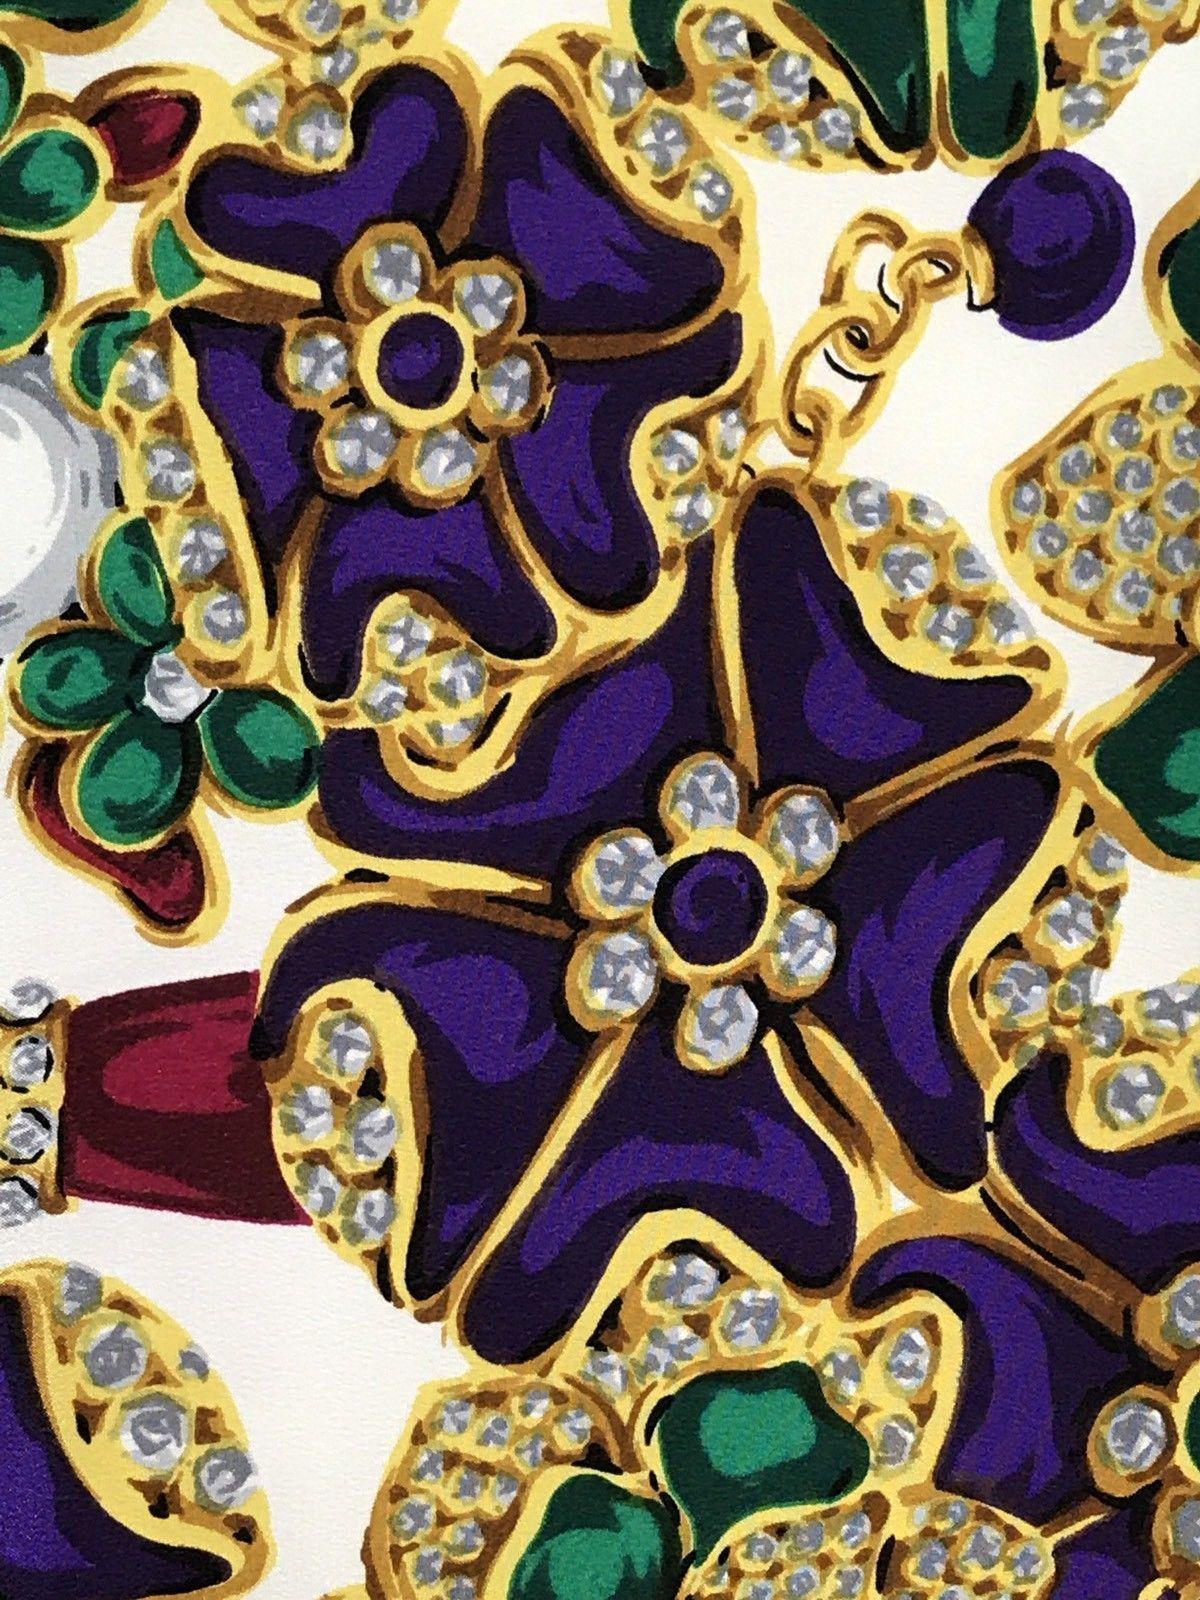 25299e9077a1 CHANEL Tuch Seide foulard scarf Stola stole silk soie carre geant Jewels  Schmuck   eBay